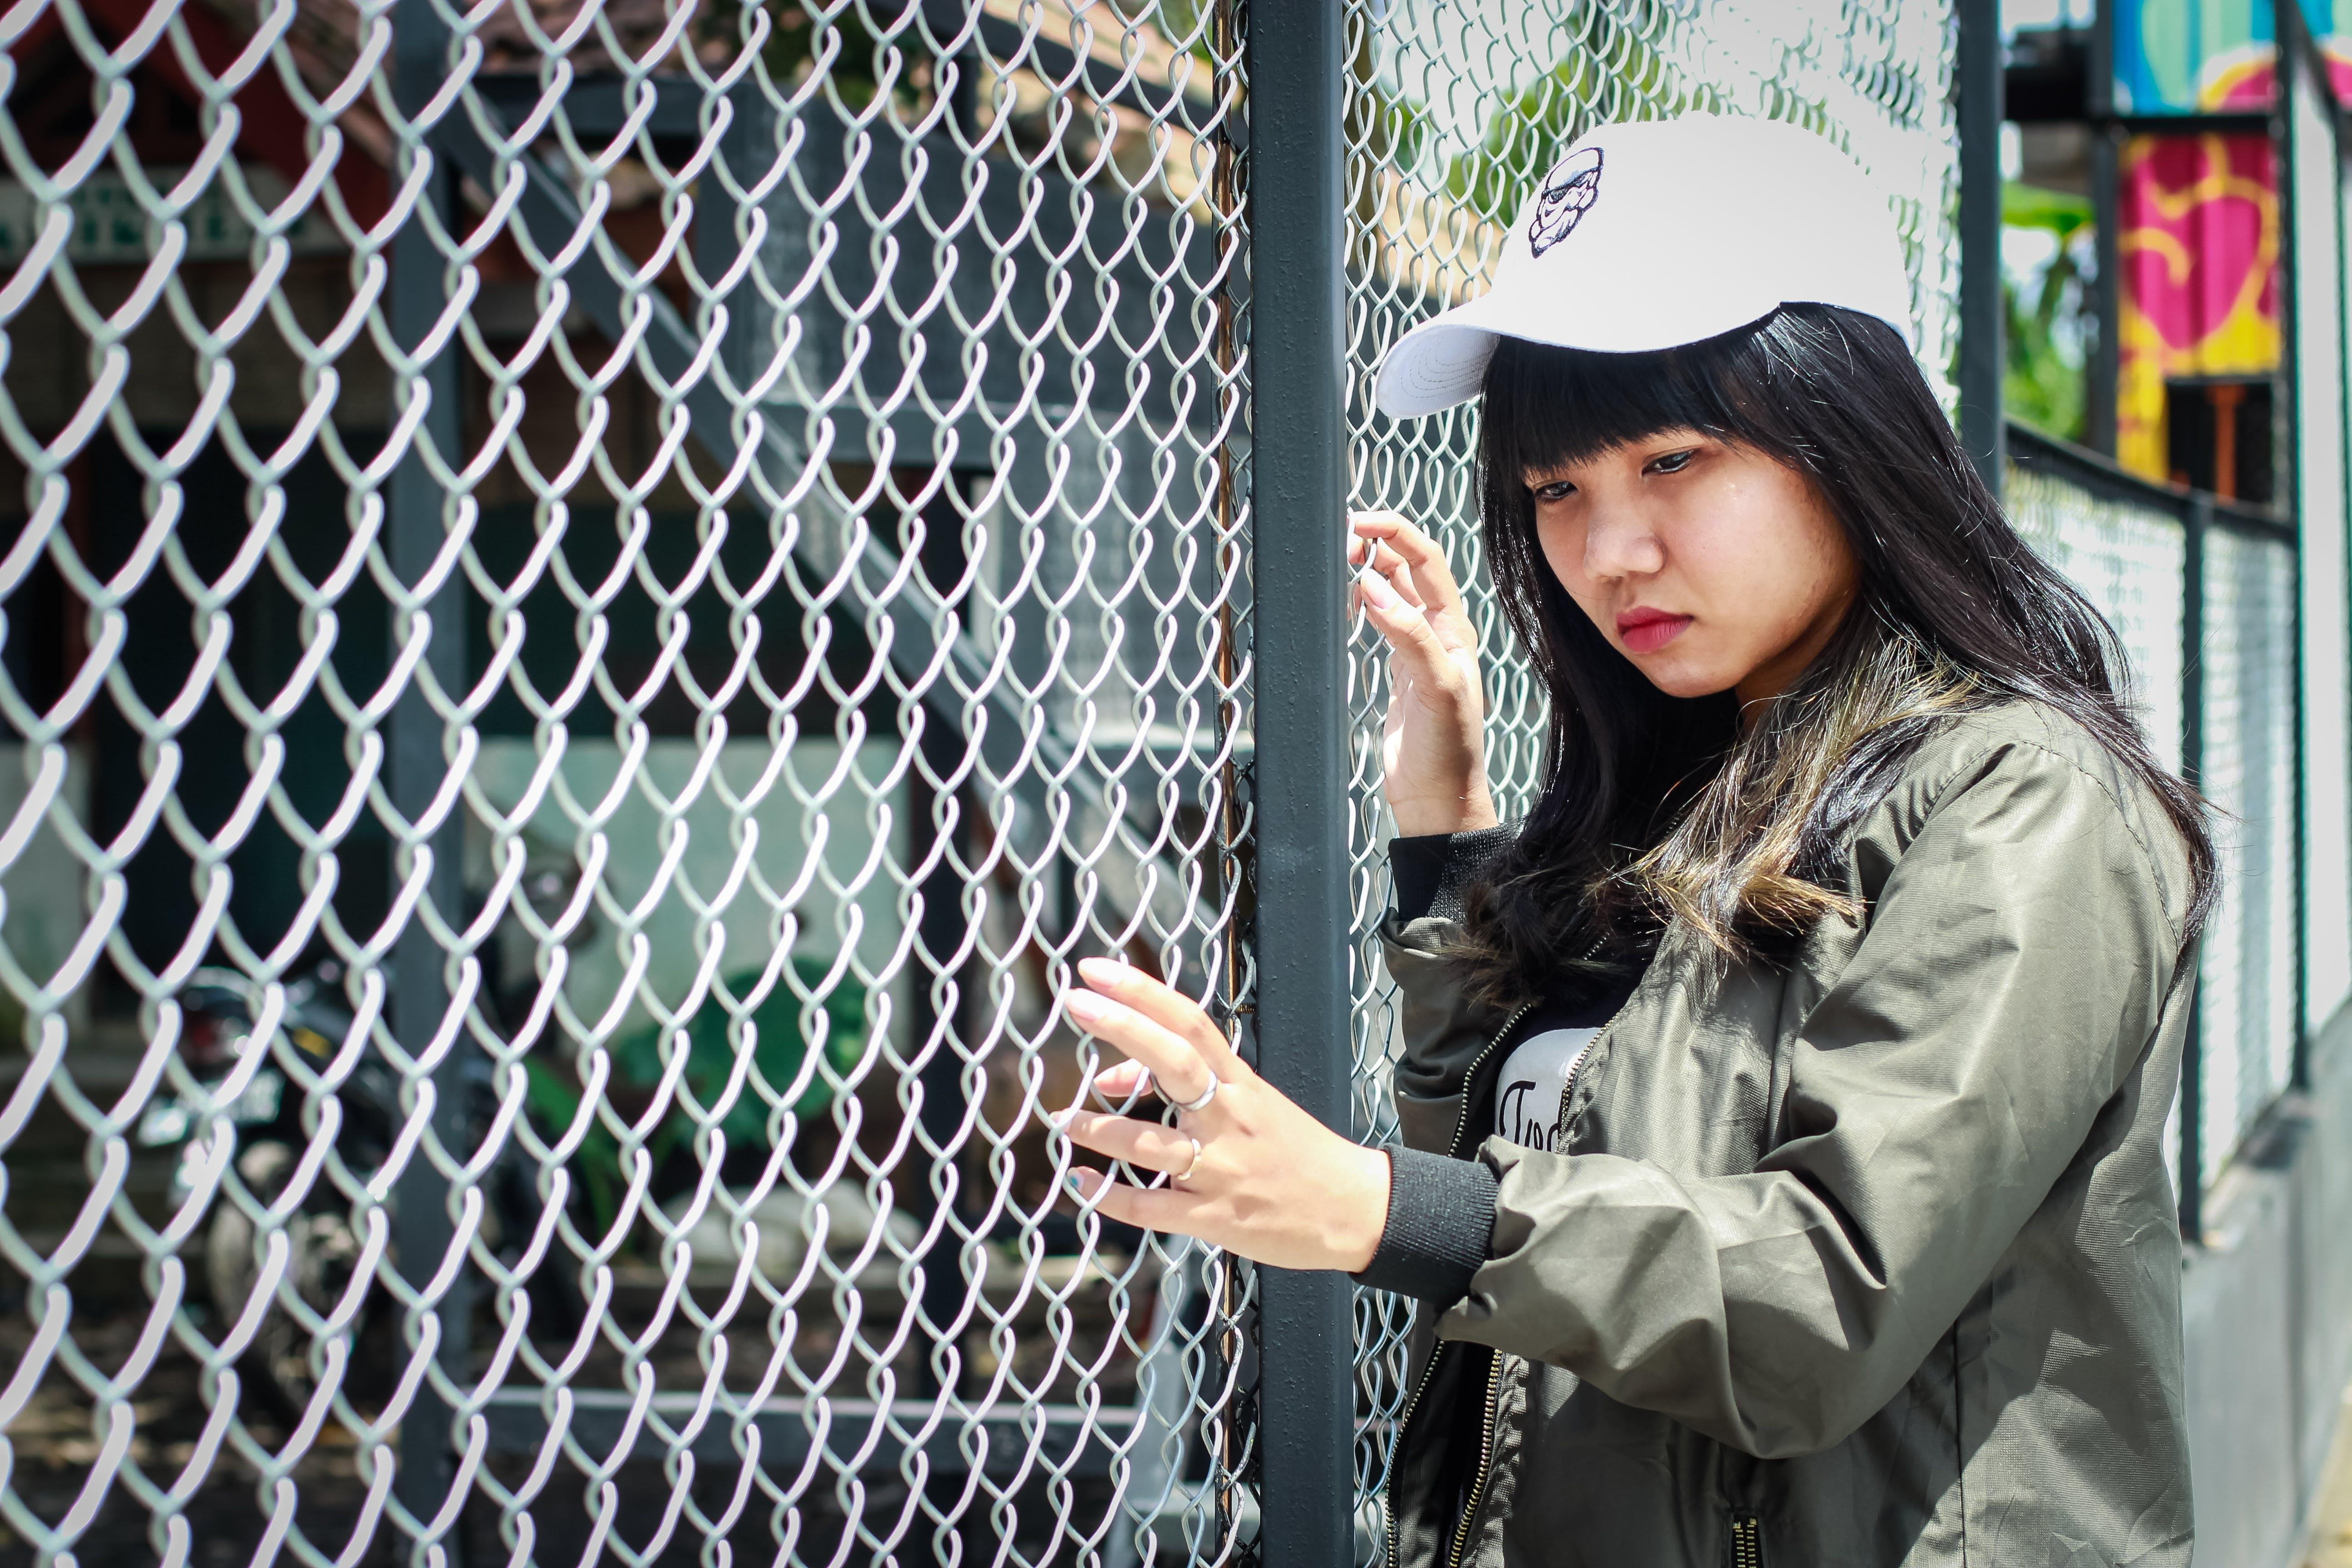 Woman Wearing Grey Bomber Jacket Leaning Near Grey Wire Fence